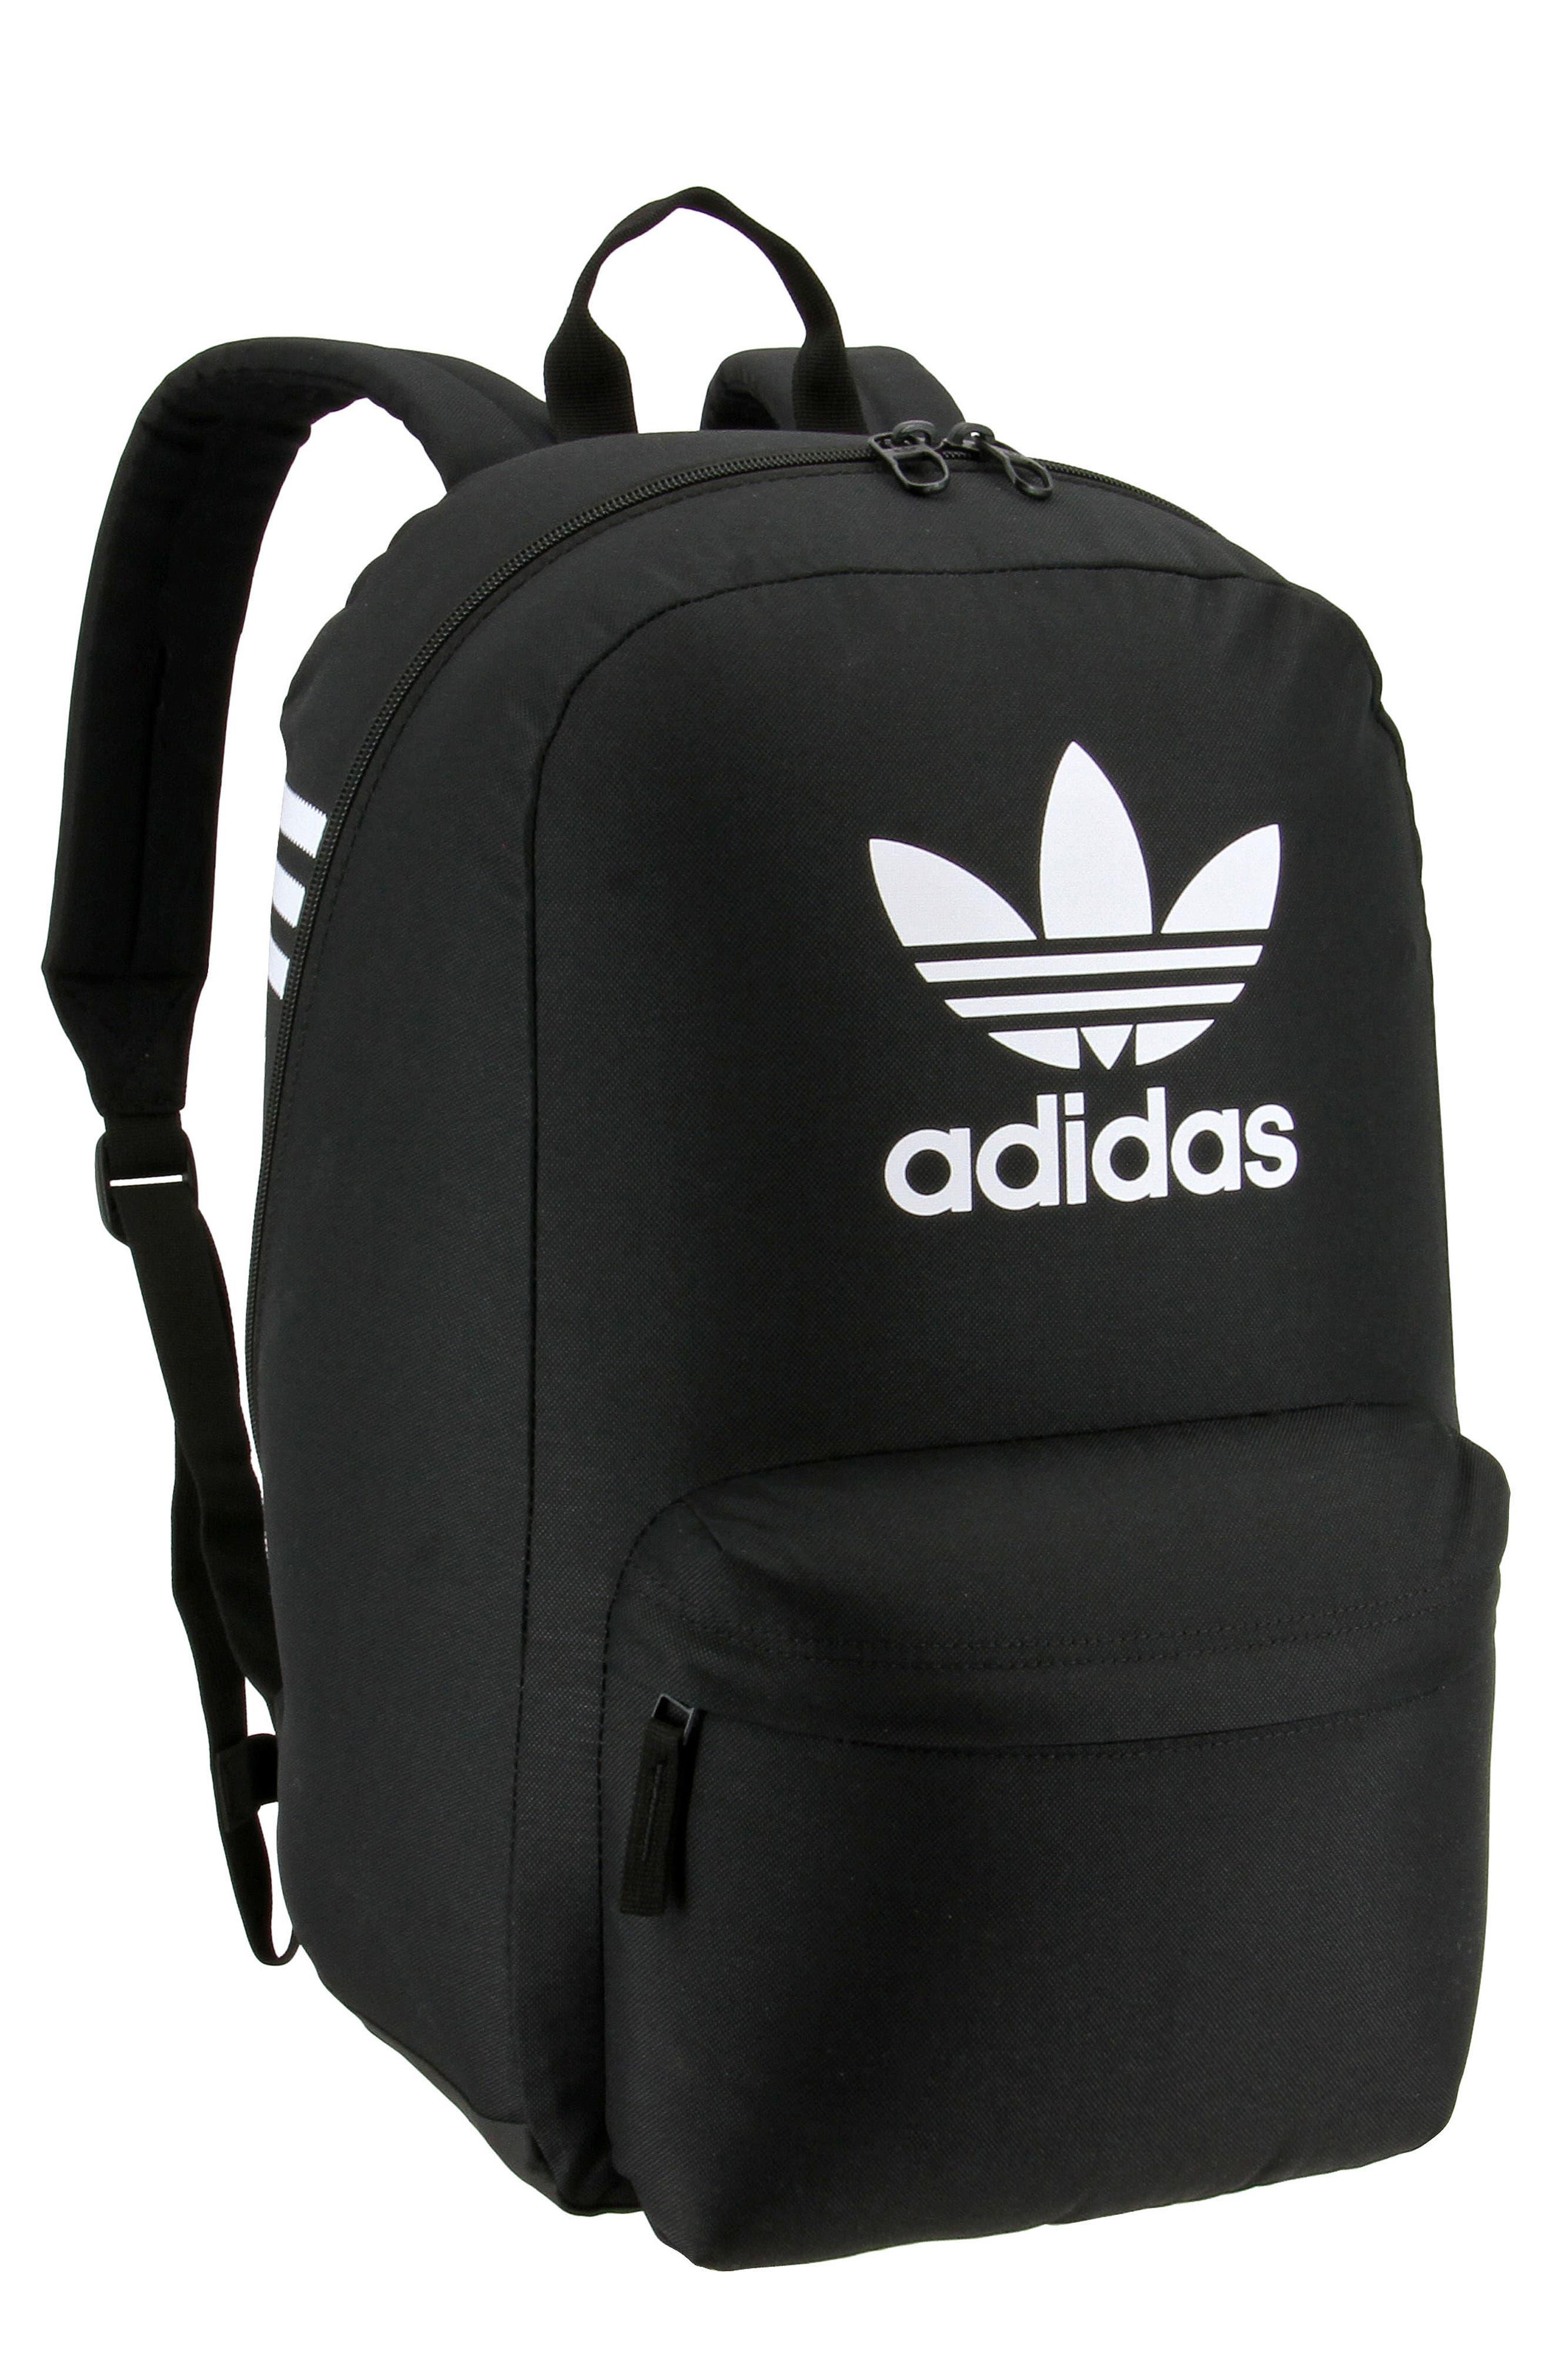 Adidas Originals Big Logo Backpack - Black